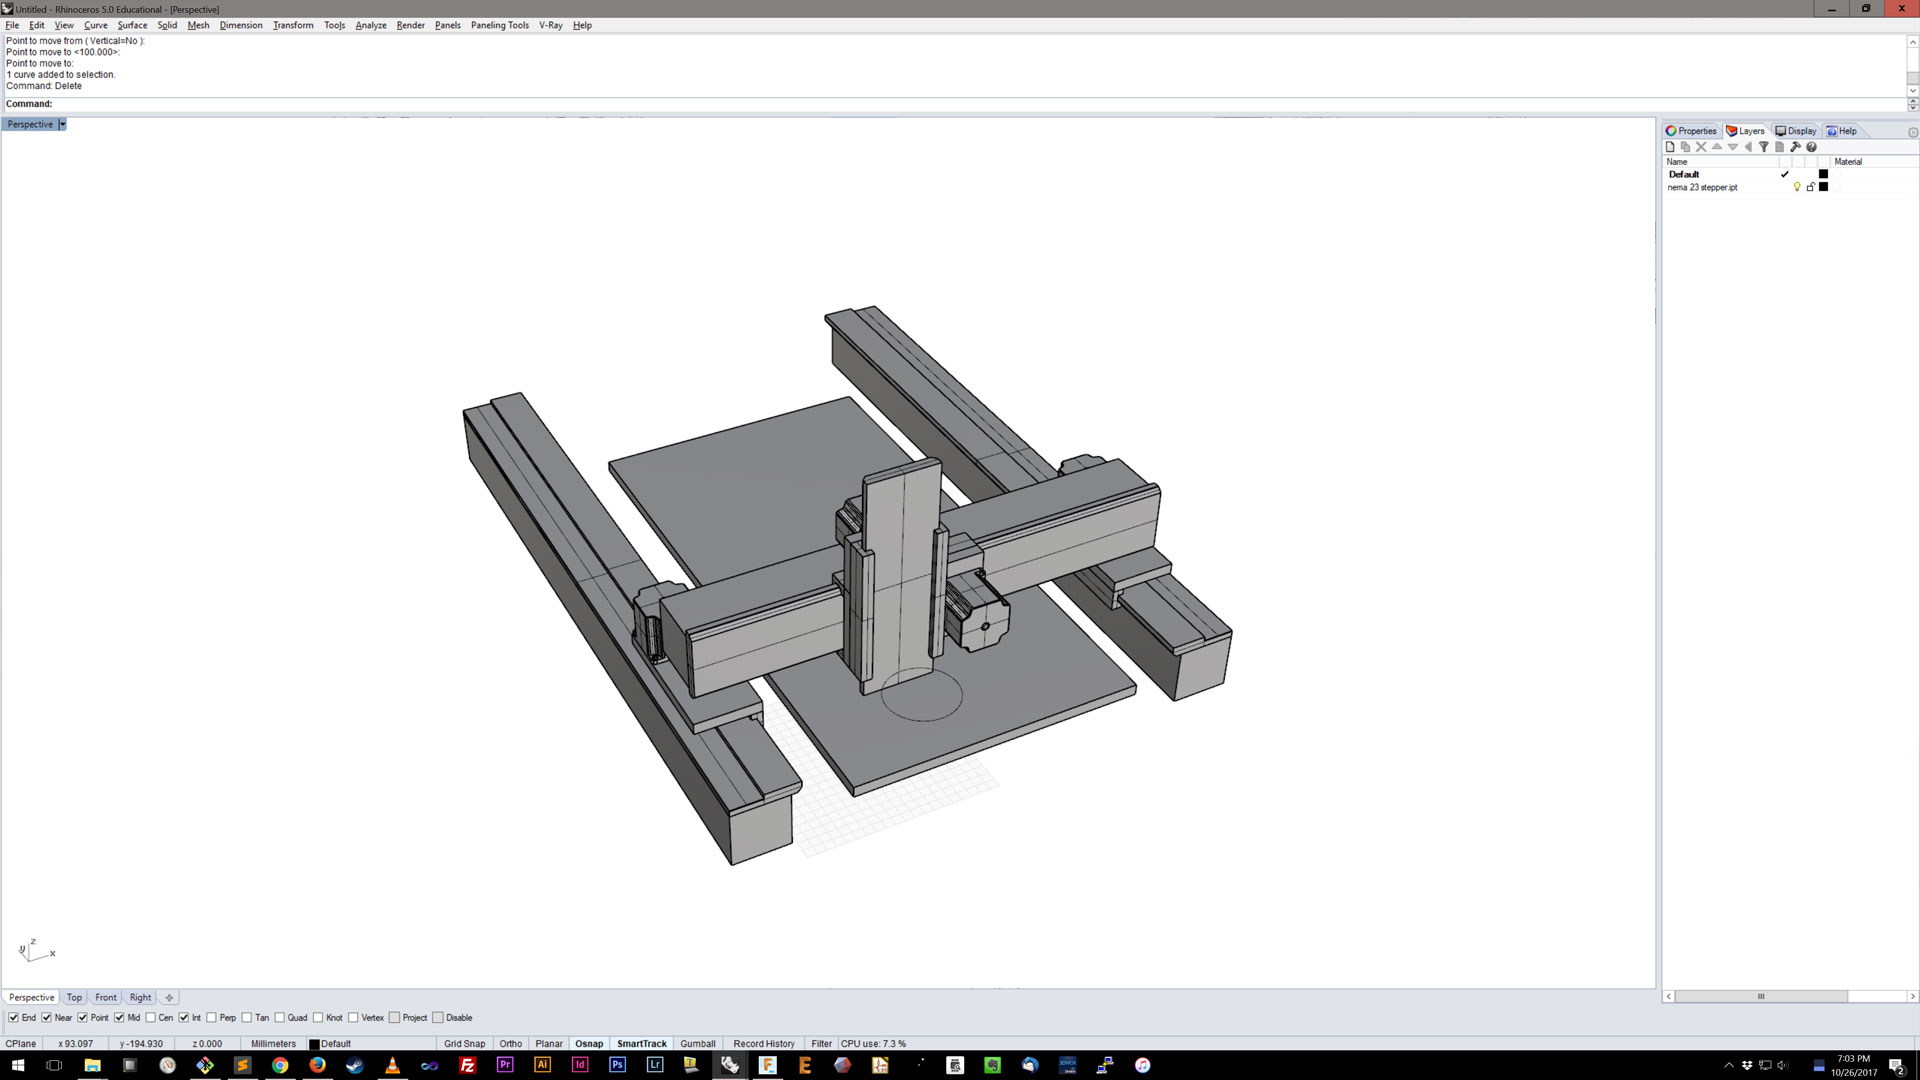 images/layout-machine.jpg